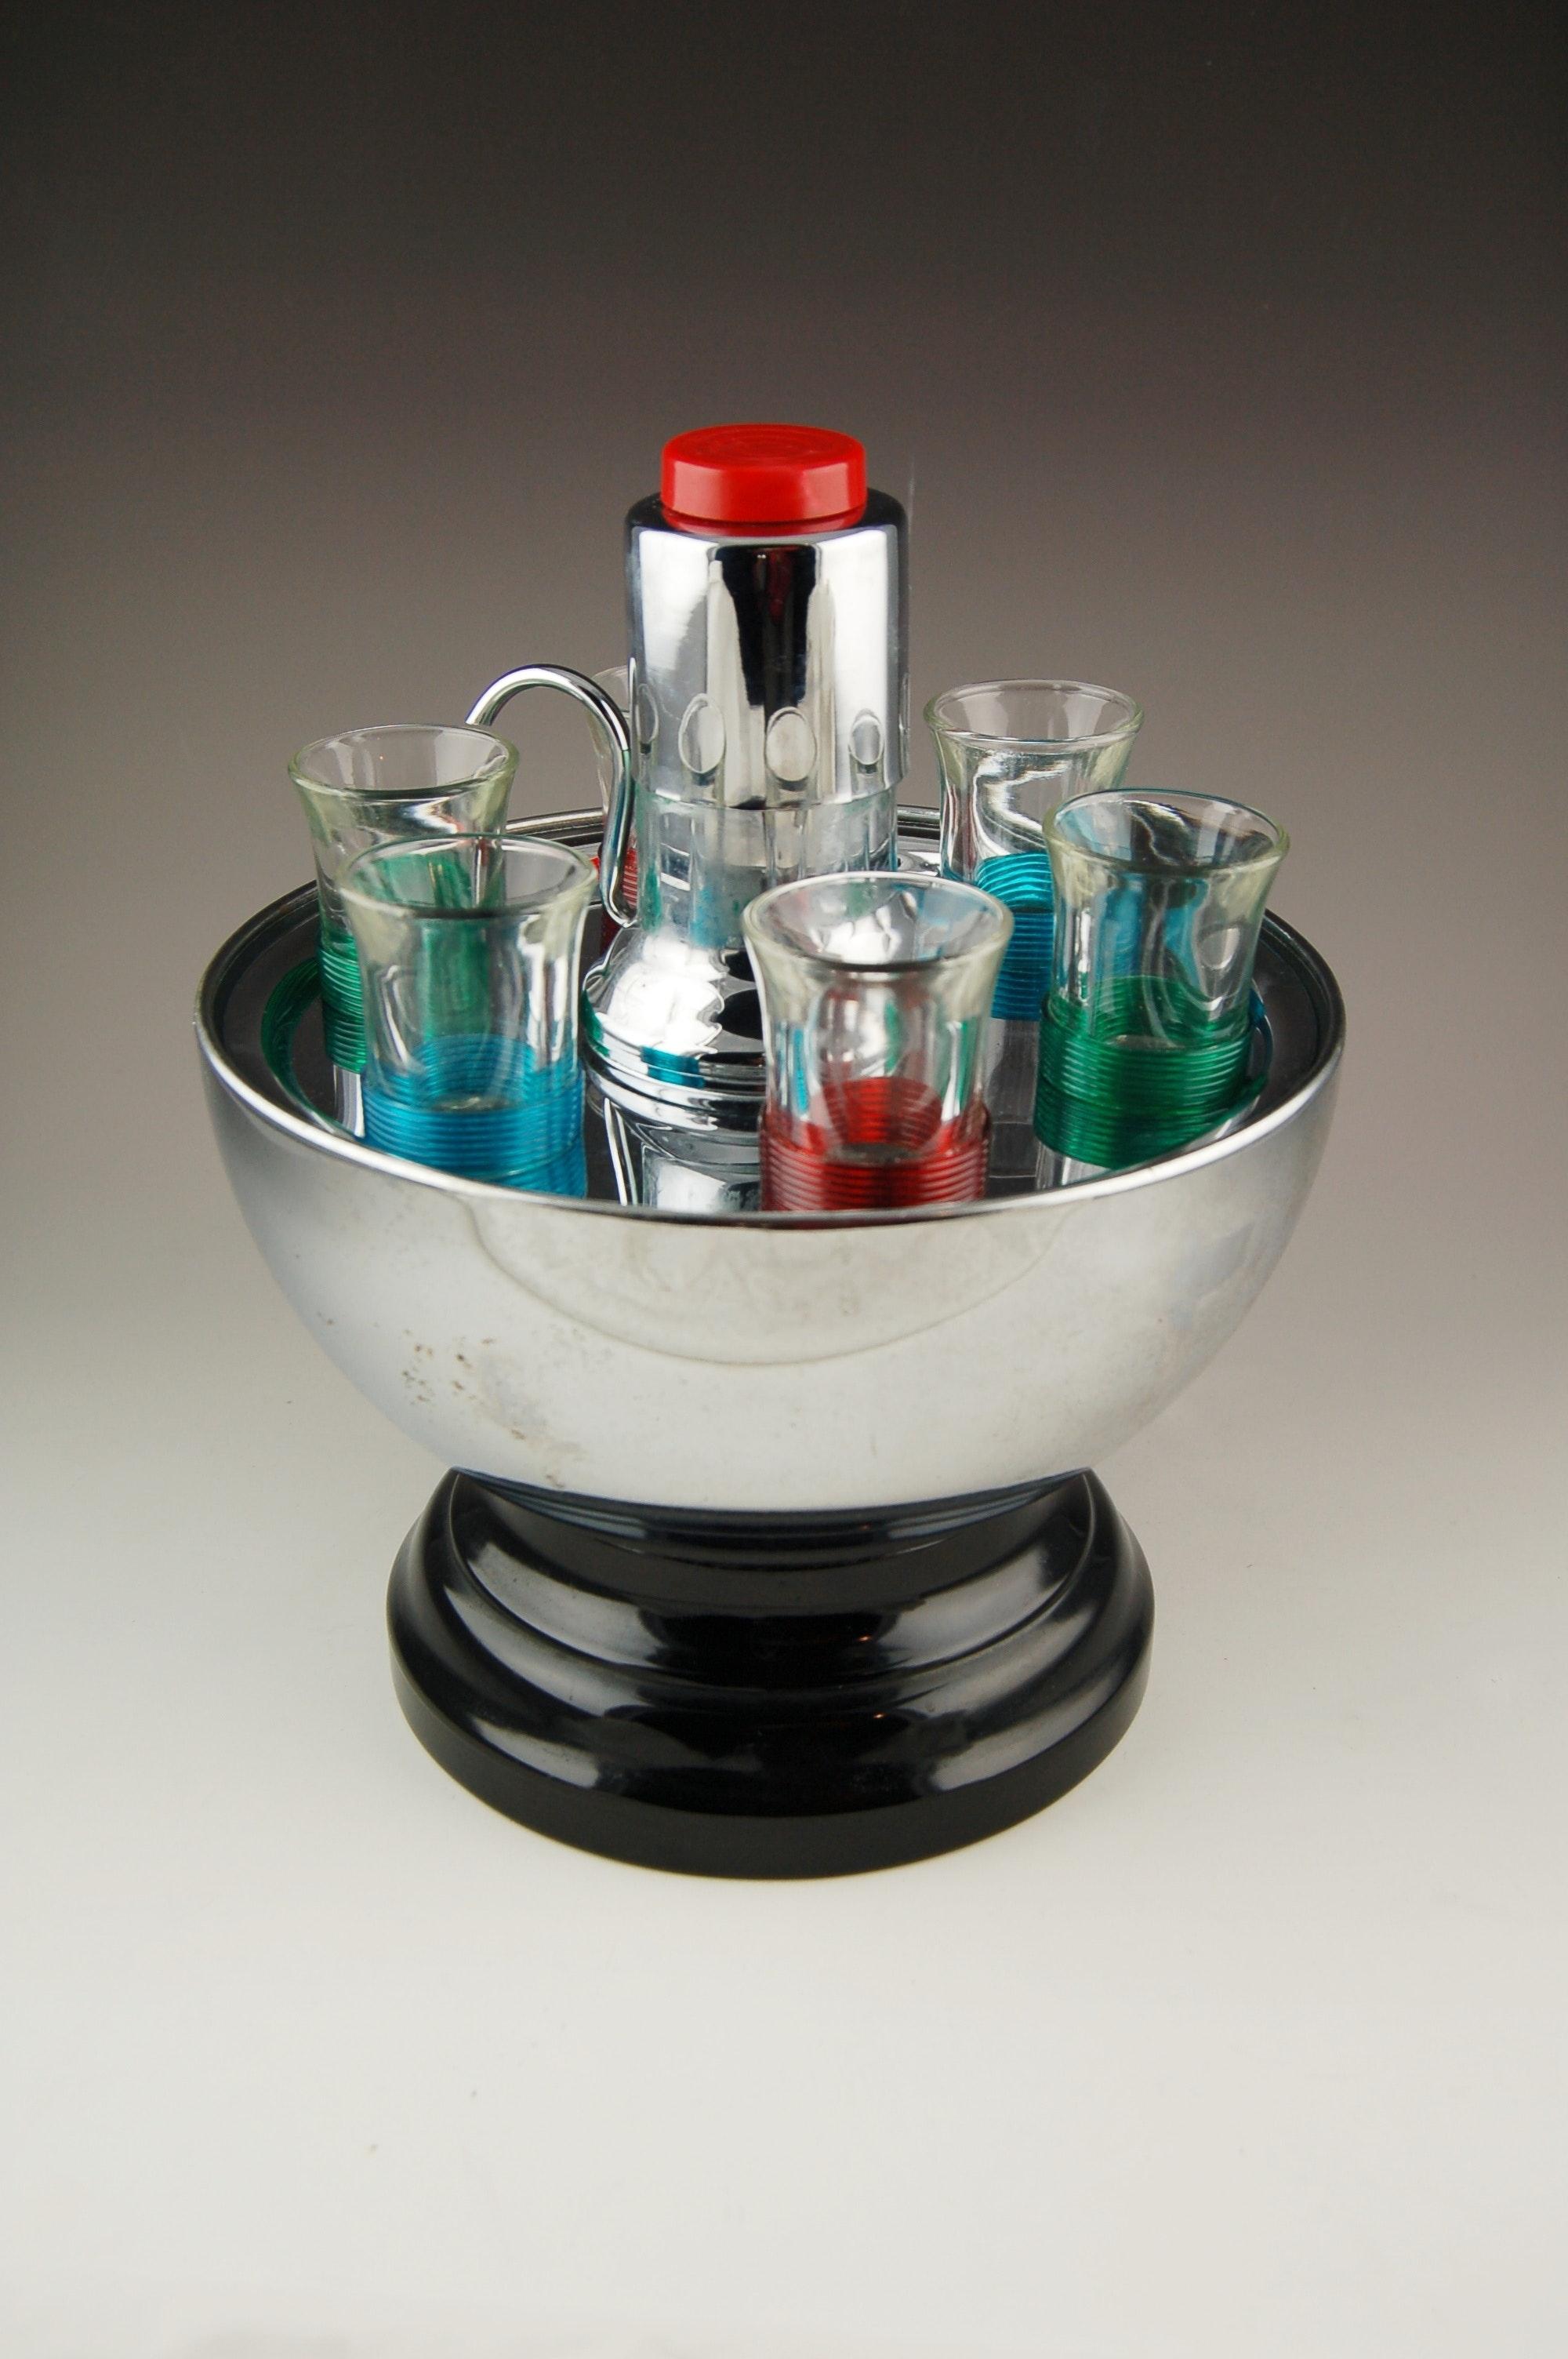 Vintage Chrome Dome Liquor Dispenser